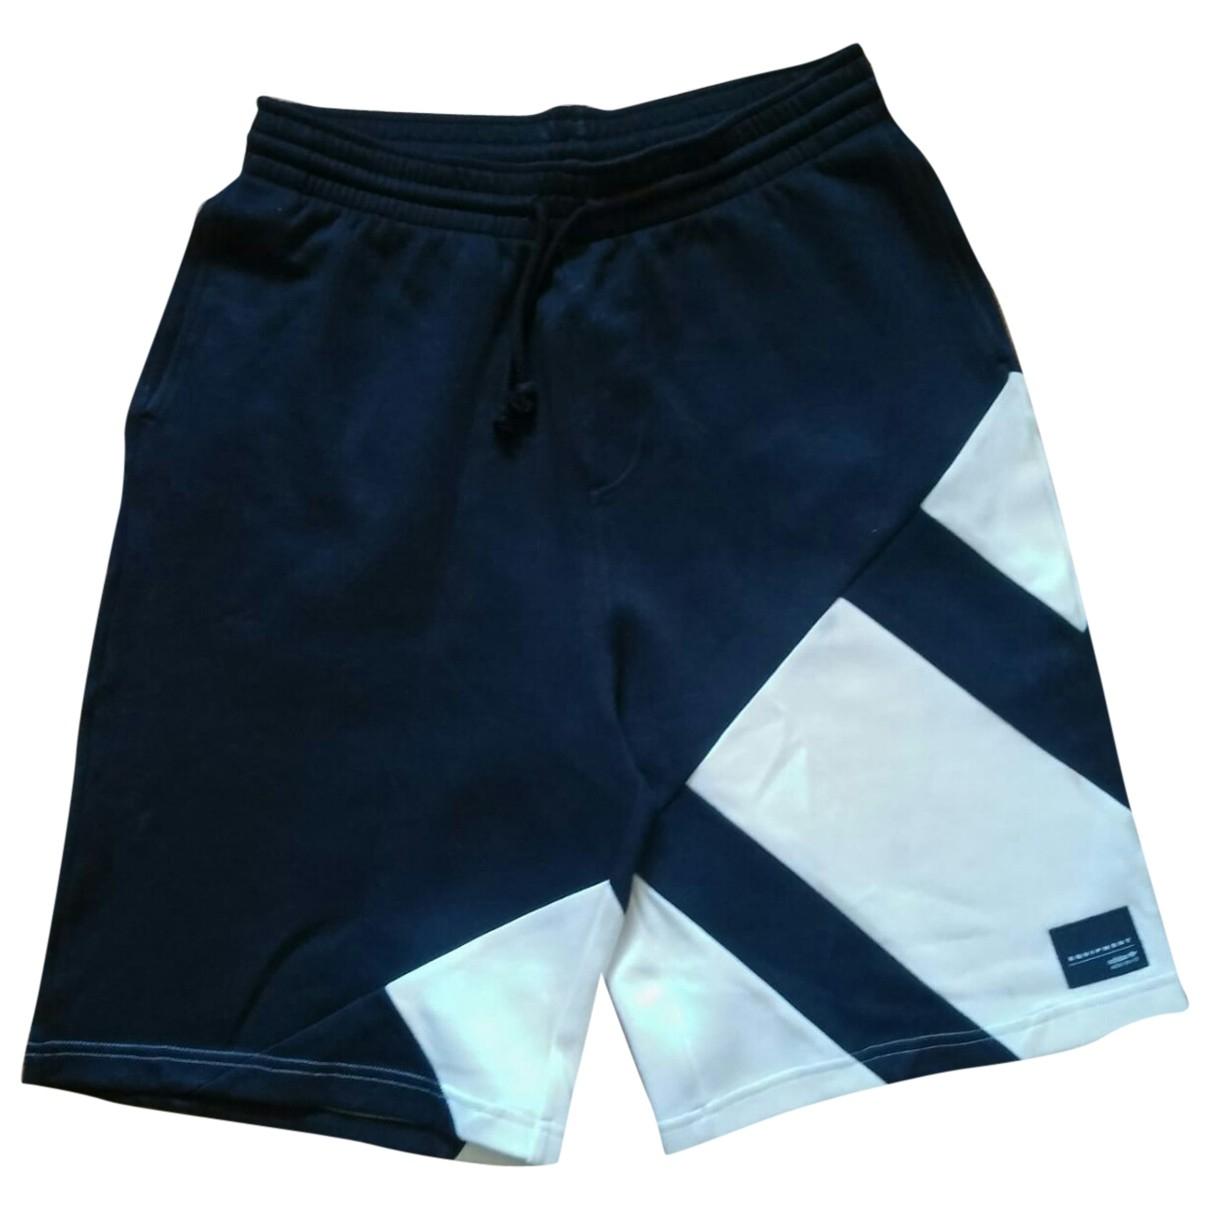 Adidas \N Black Cotton Shorts for Men S International